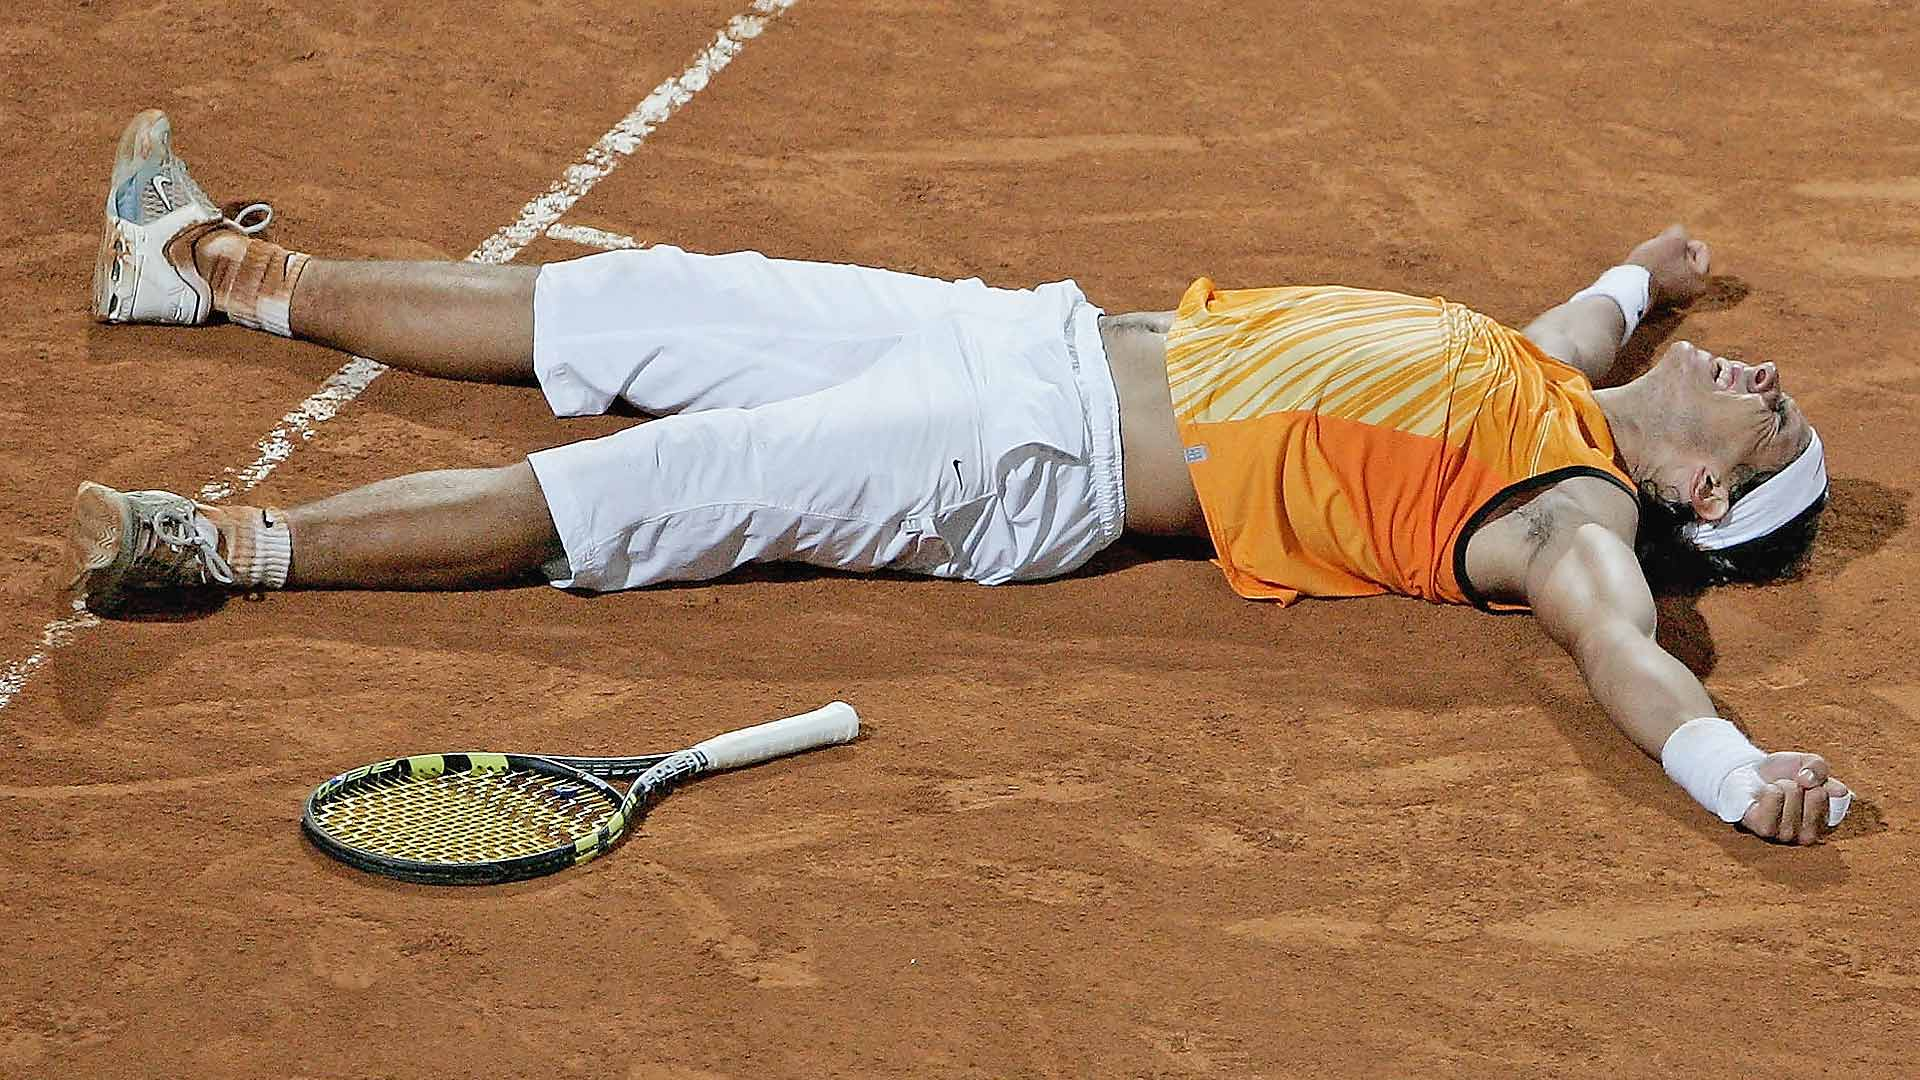 <a href='https://www.atptour.com/en/players/rafael-nadal/n409/overview'>Rafael Nadal</a>